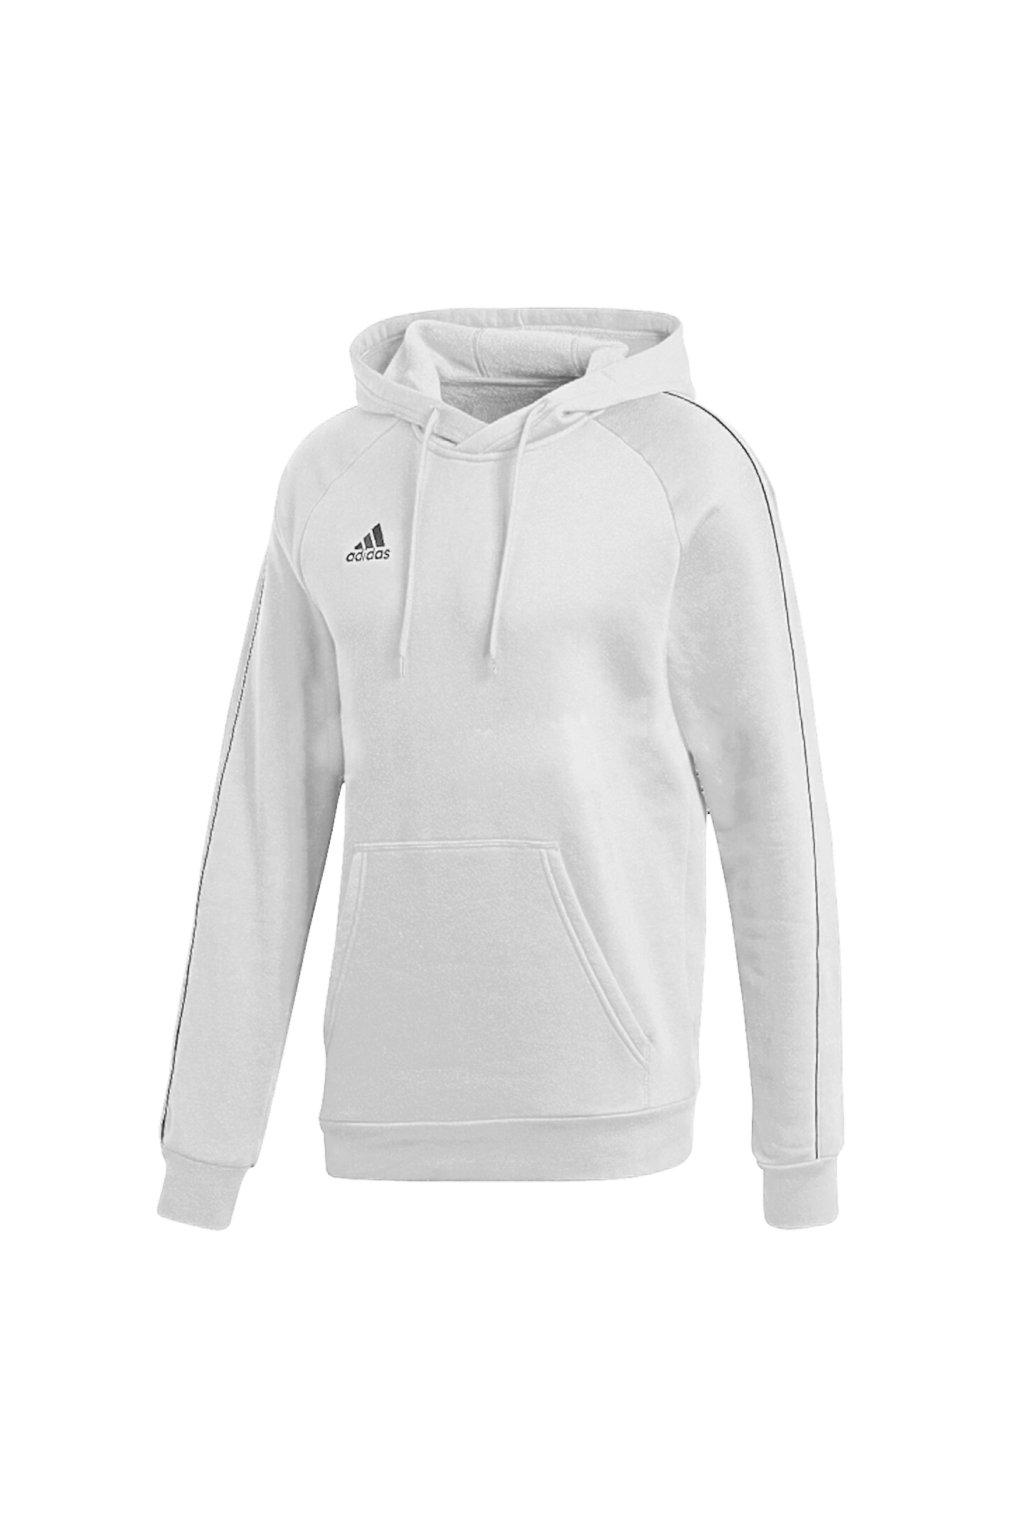 Pánska mikina Adidas Core 18 Hoody biela FS1895